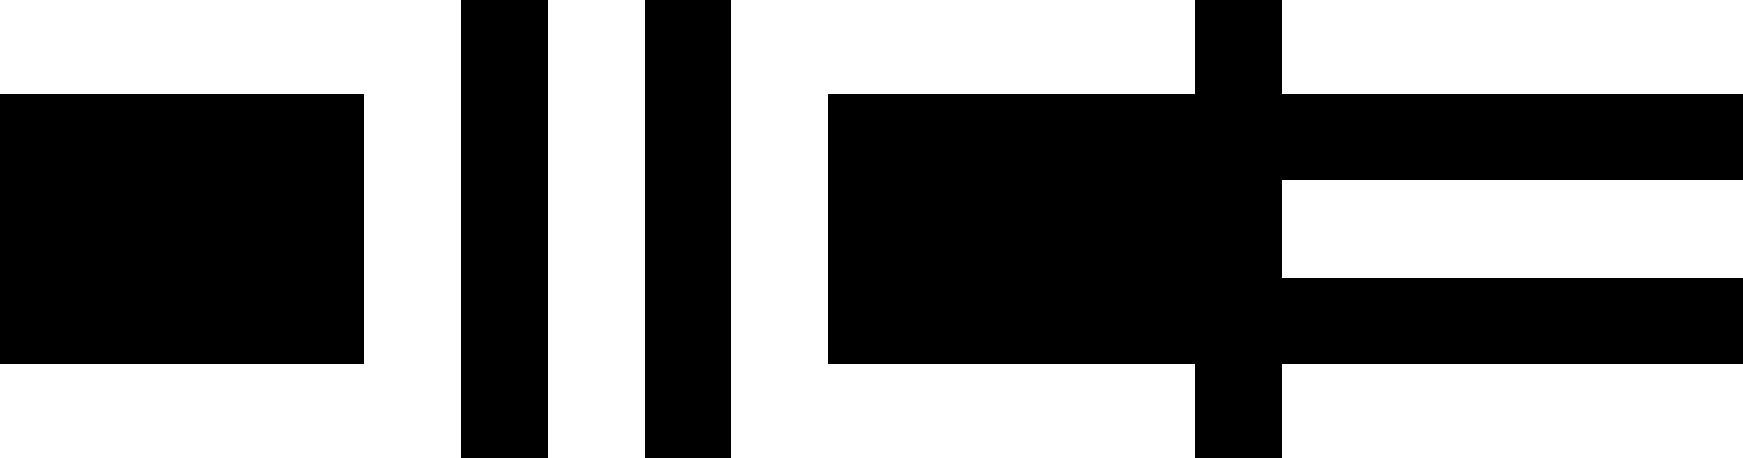 DICE Logo Vector by dsrange431